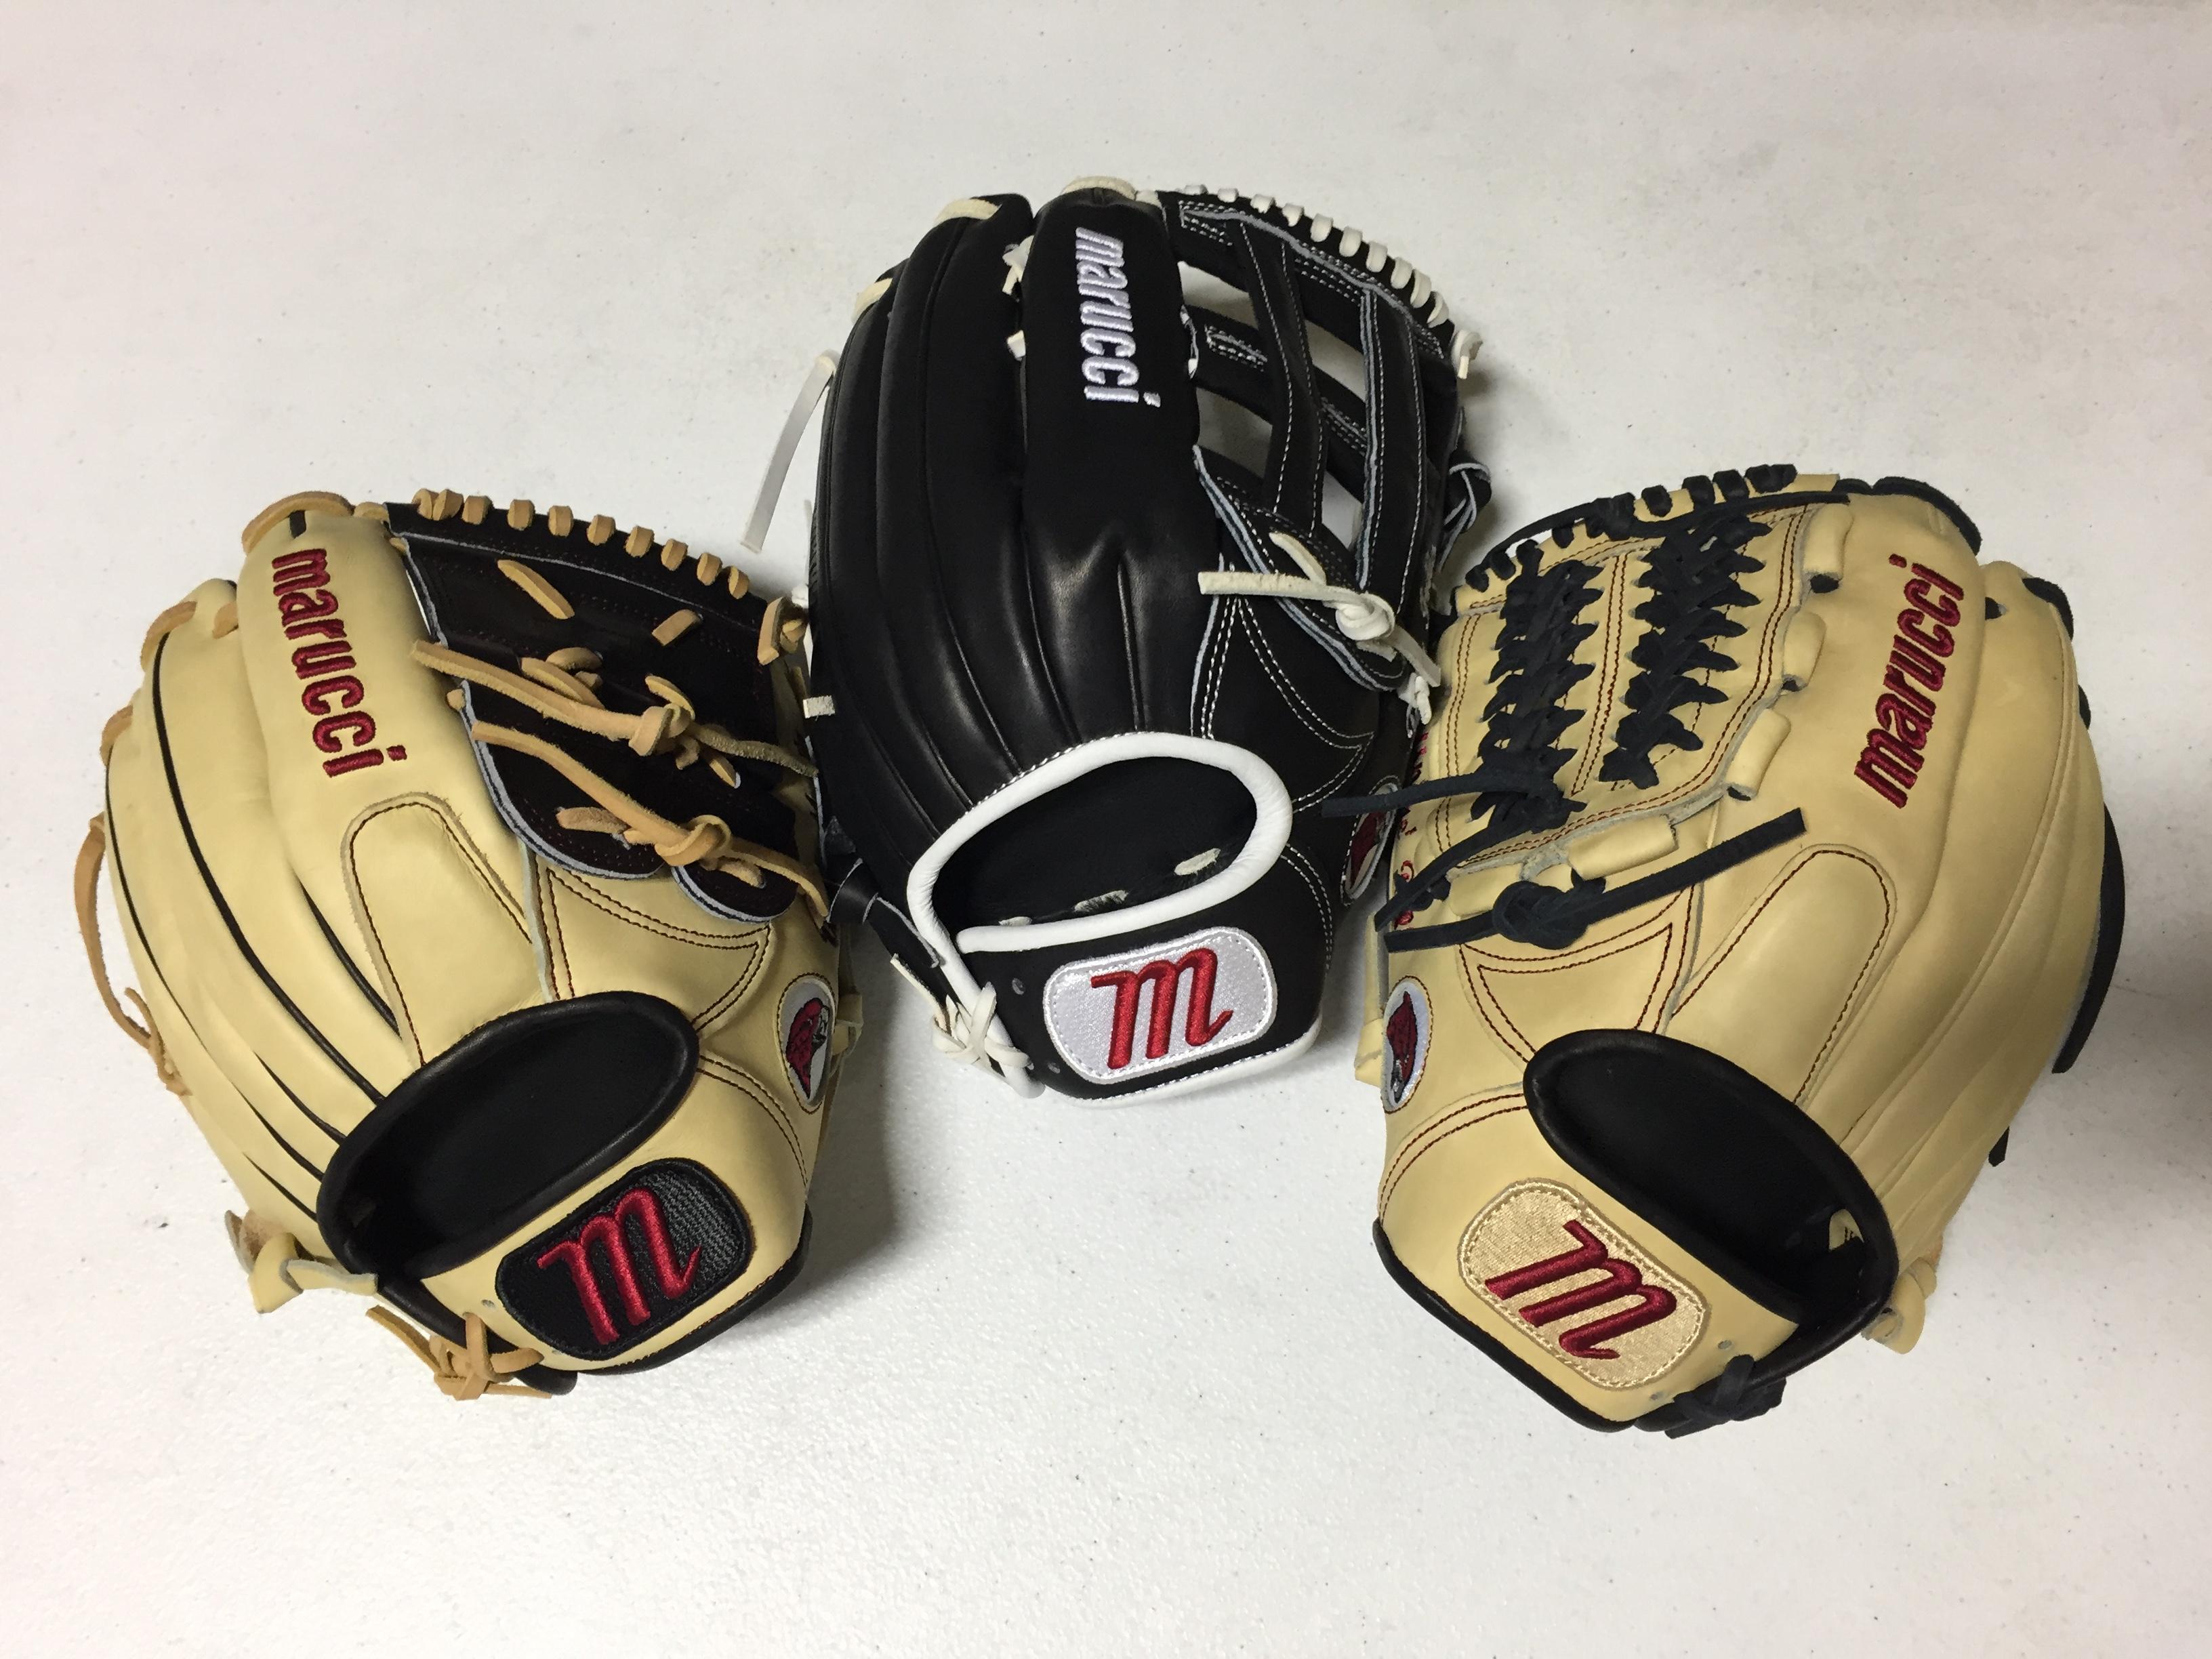 Softball Bats For Sale >> Custom Fielding Gloves - Marucci Sports